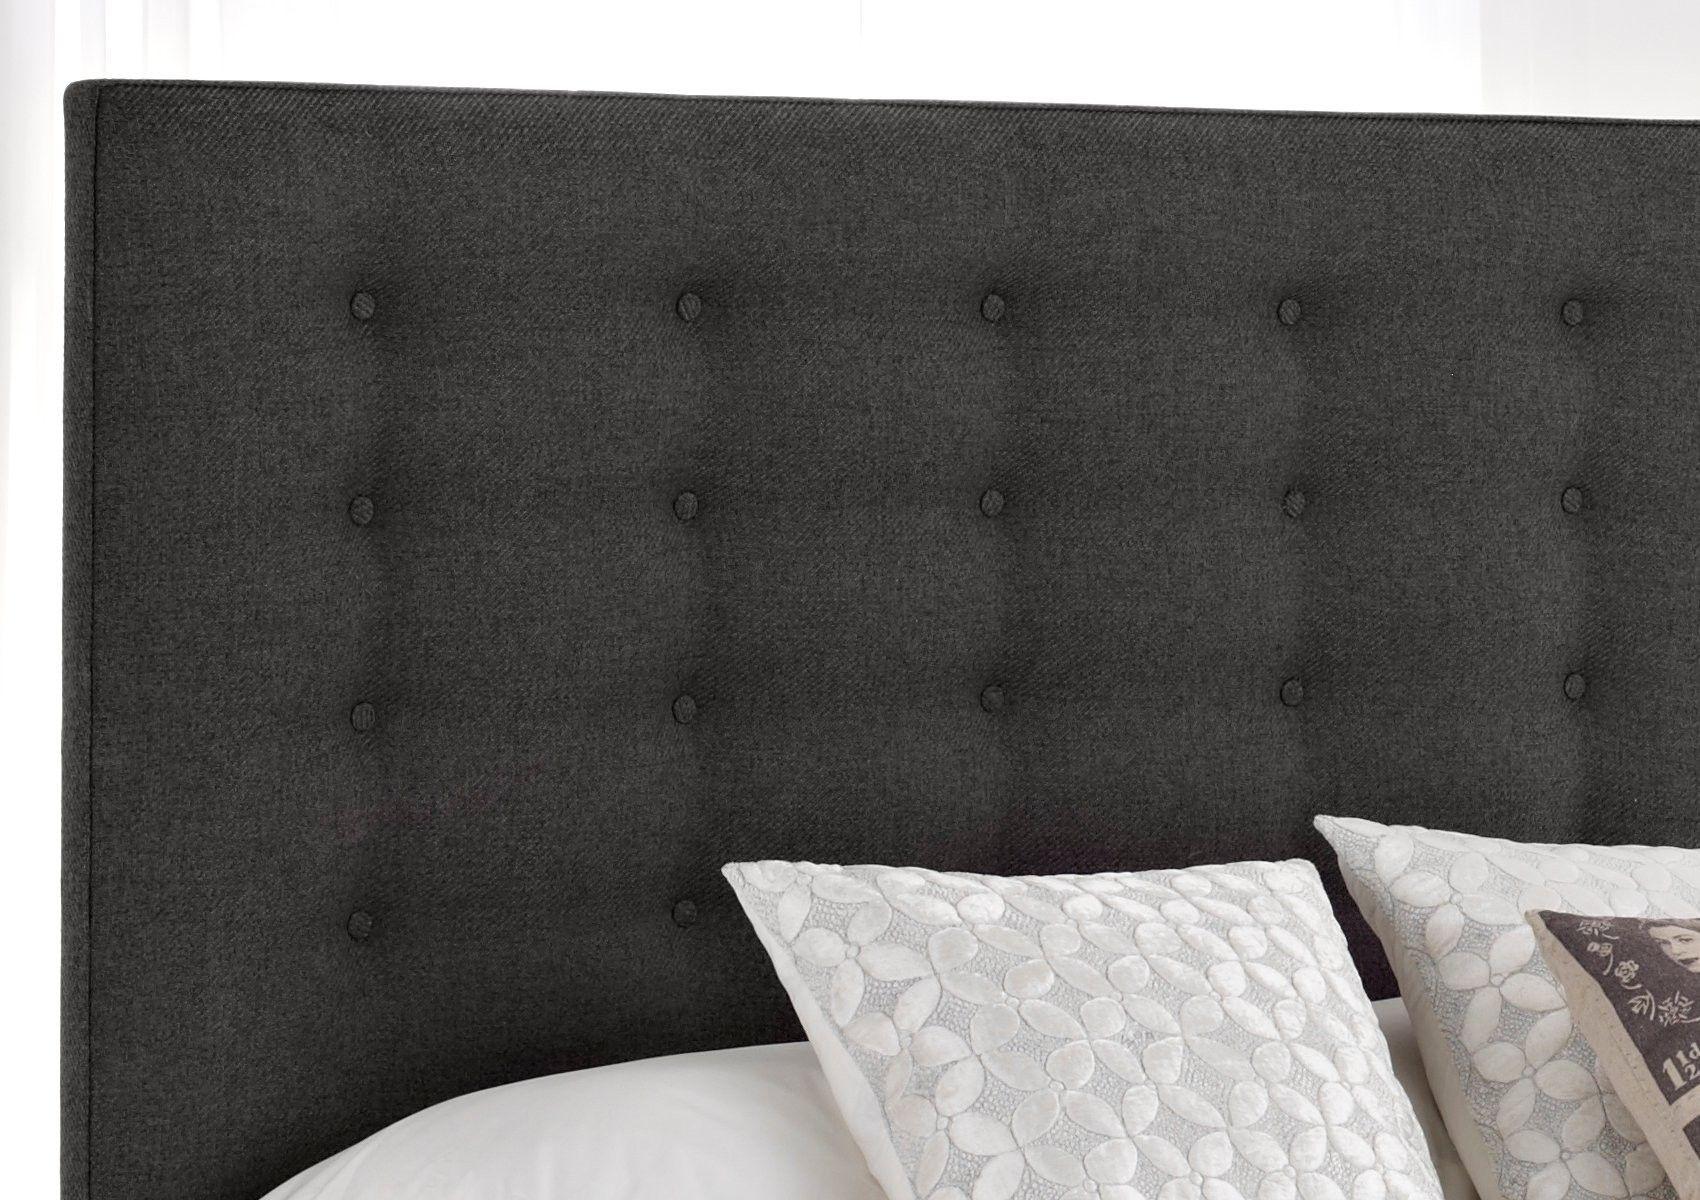 Mayfair Upholstered Floor Standing Headboard